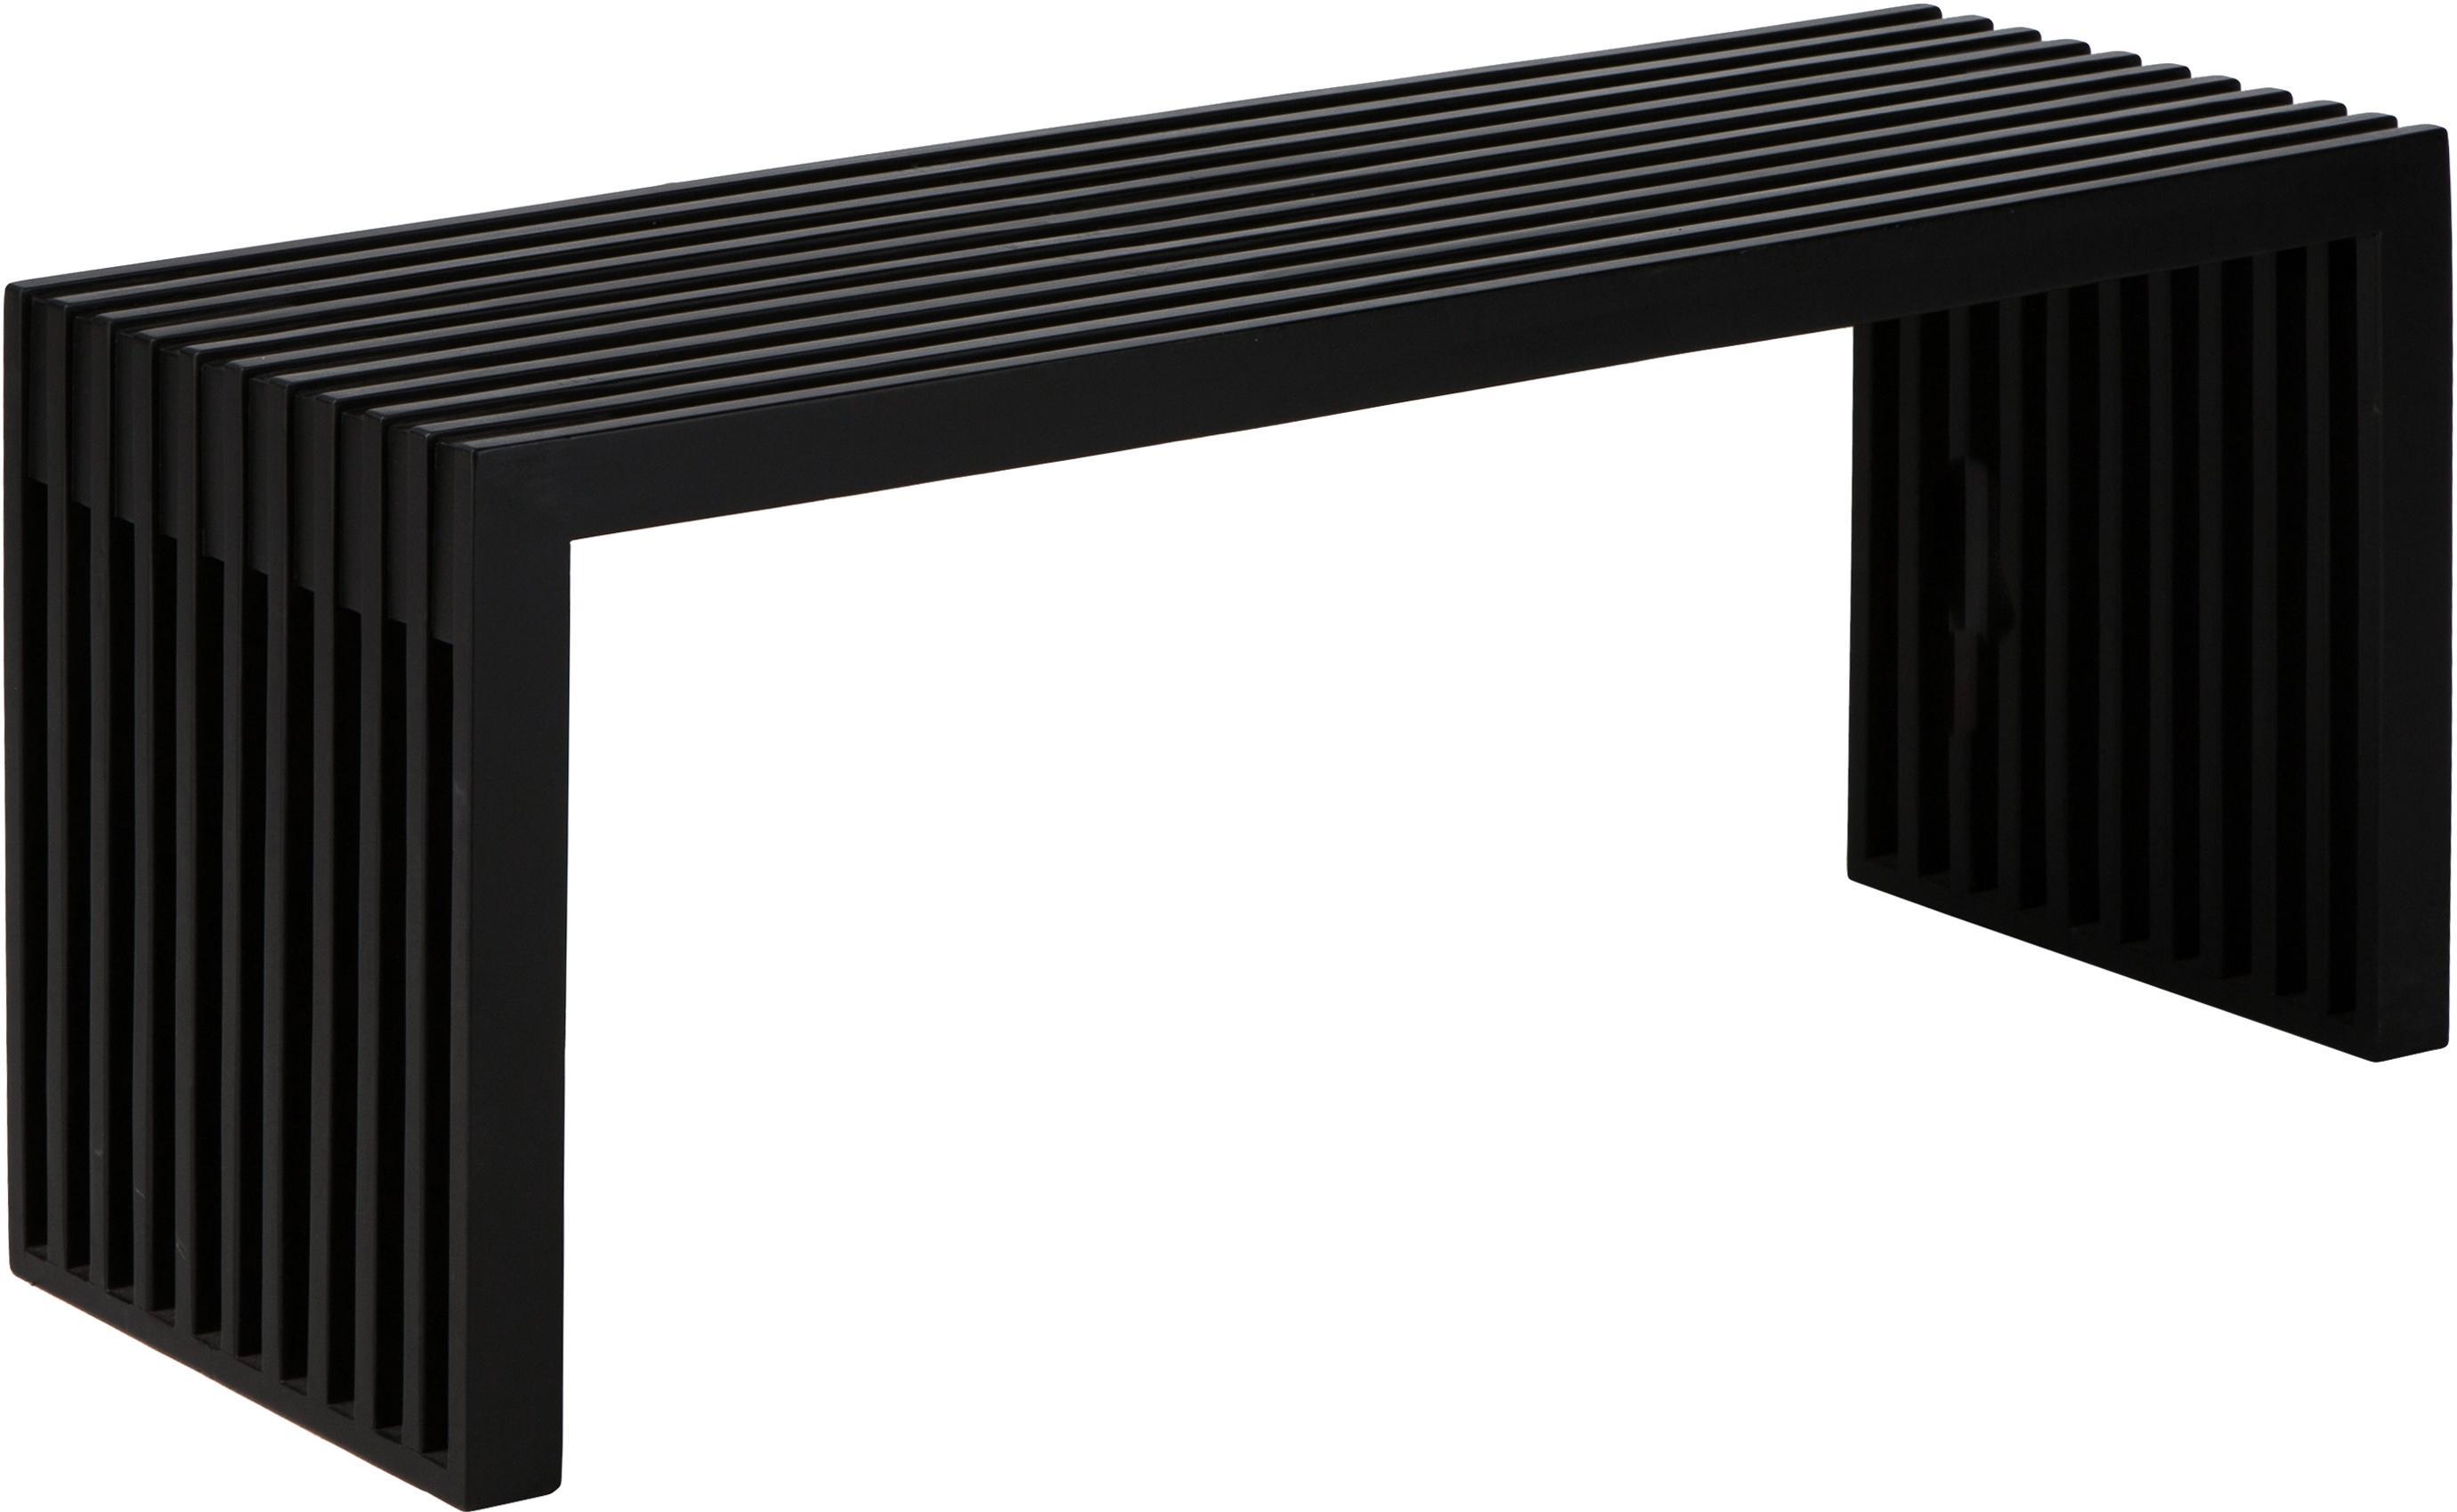 Panca moderna in mogano Rib, Legno di mogano verniciato, Nero, Larg. 104 x Alt. 43 cm